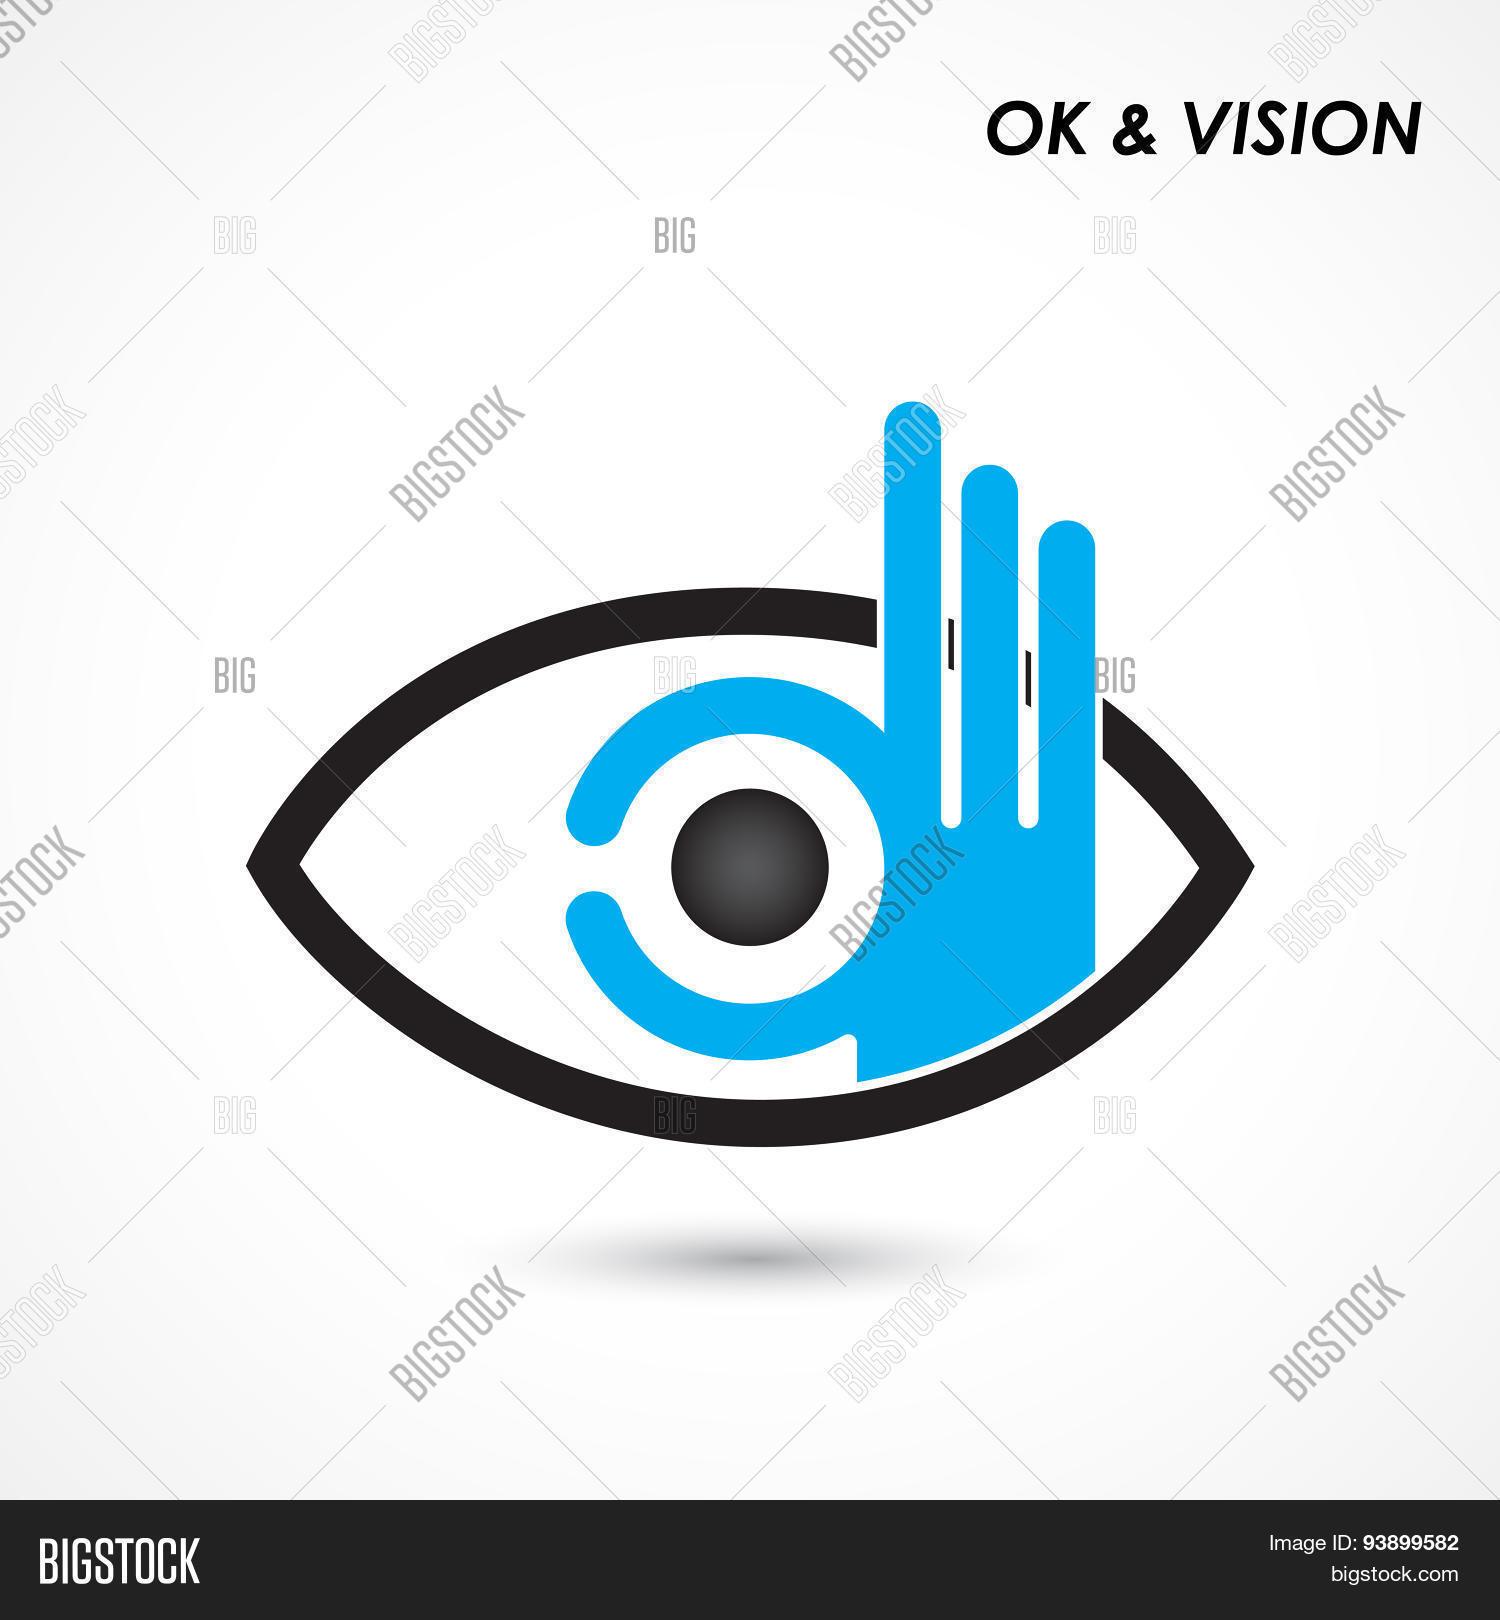 Ok Hand Eye Sign Vector Photo Free Trial Bigstock